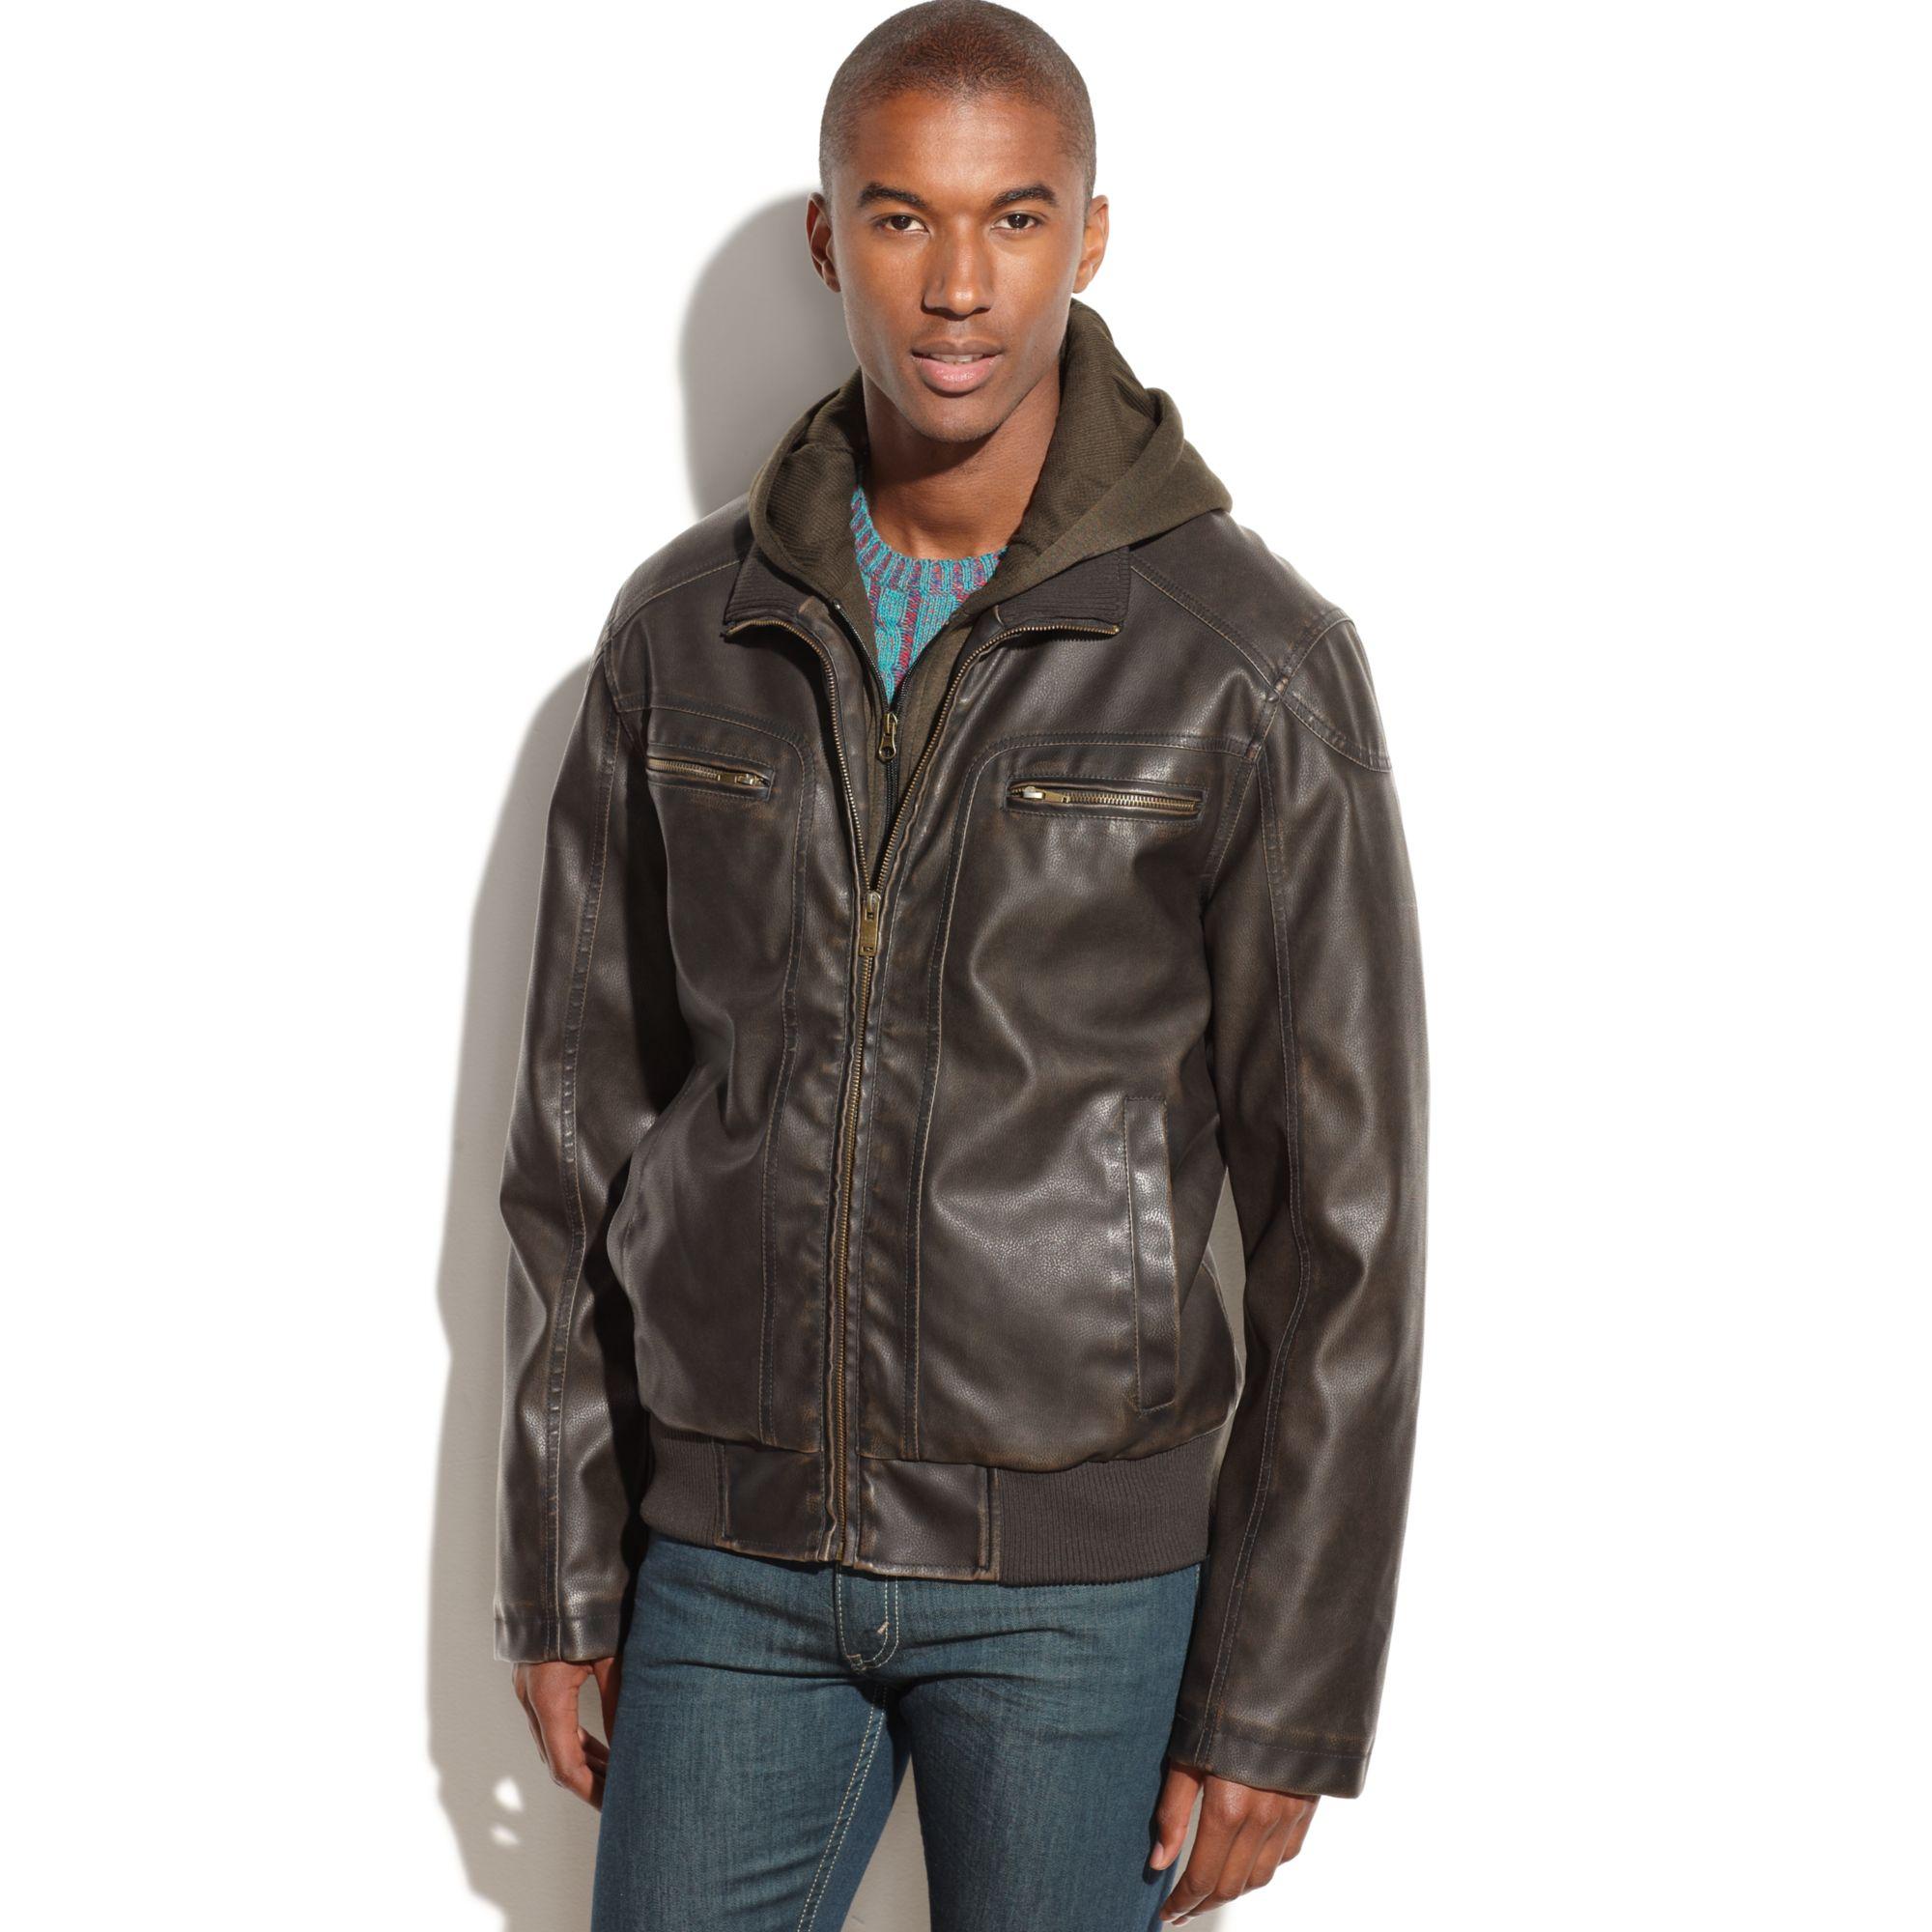 Sean john leather jackets